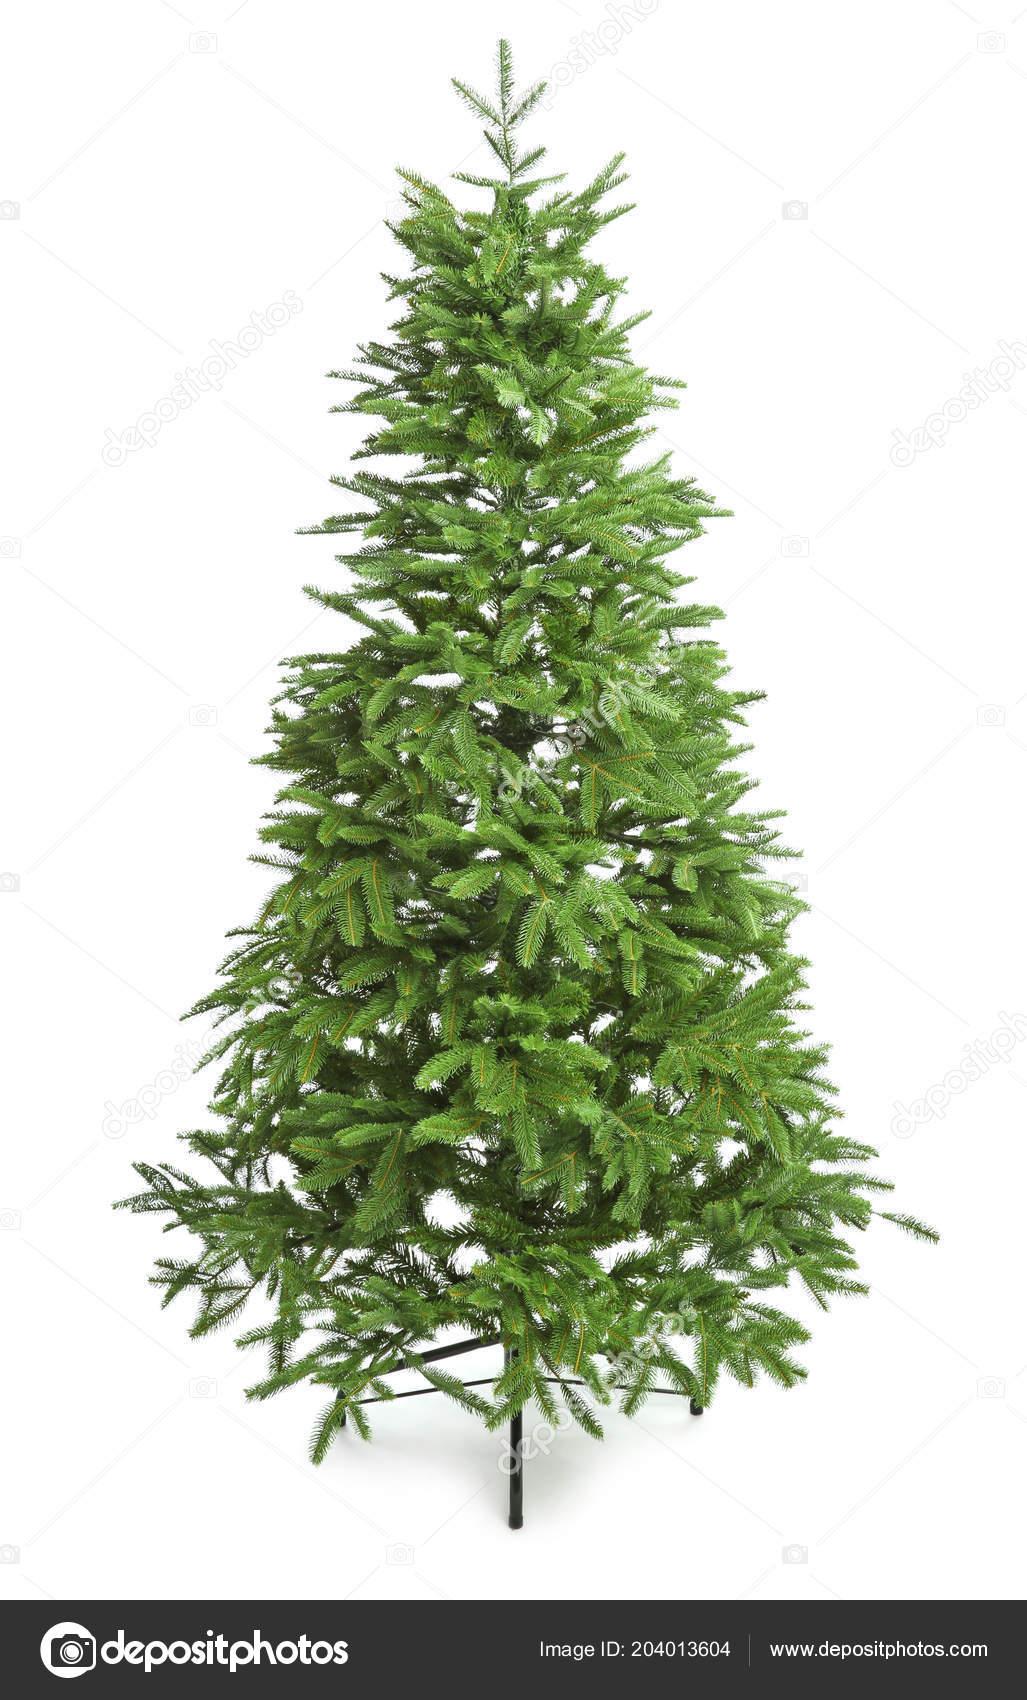 Christmas Tree White Background.Green Christmas Tree White Background Stock Photo